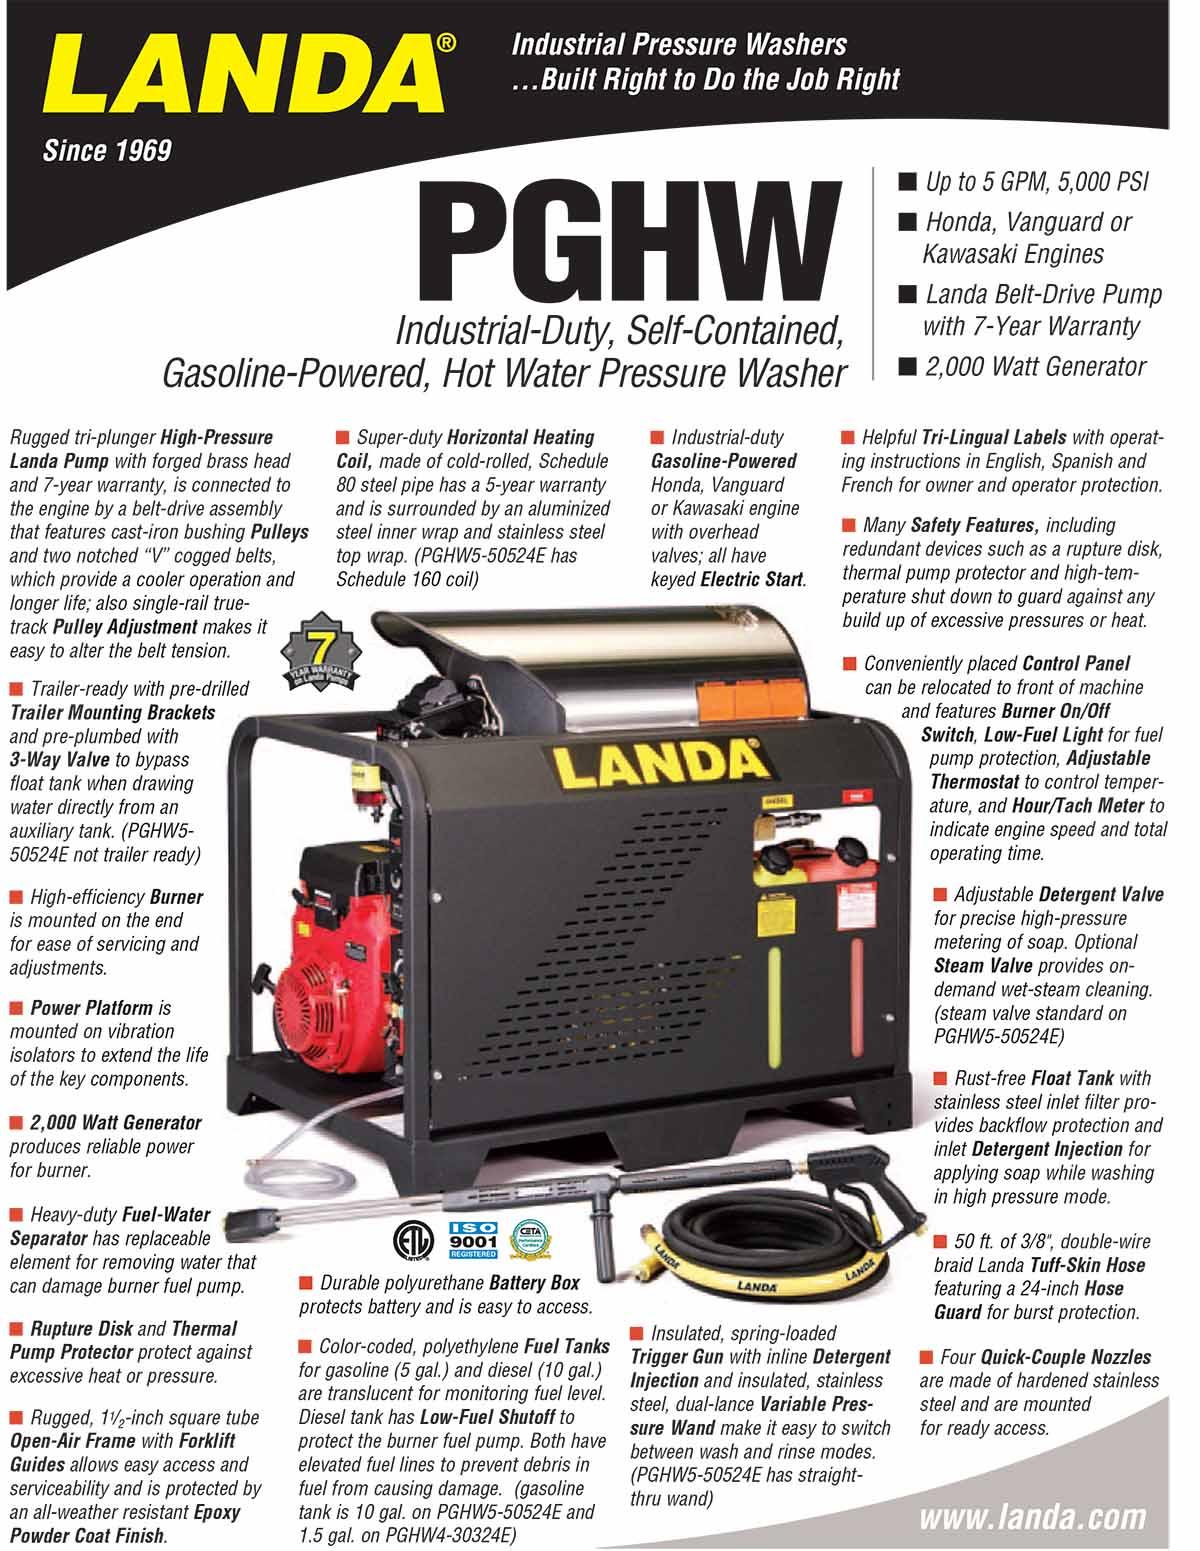 LANDA PGHW Equipment Flyer